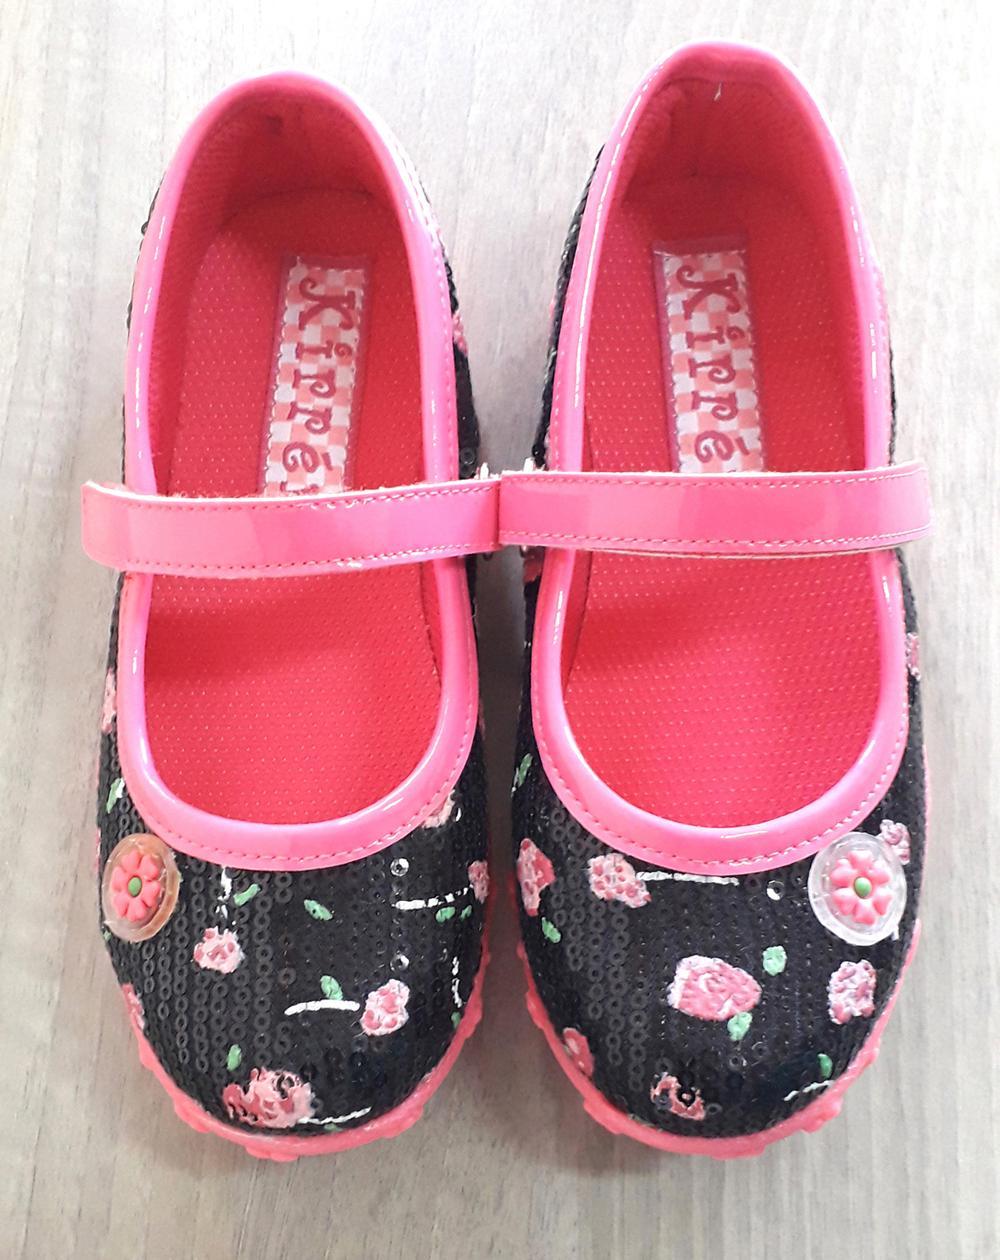 Sepatu anak anak perempuan KIPPER Tipe CLASSIC warna Hitam size 26-35 + Gift Dompet